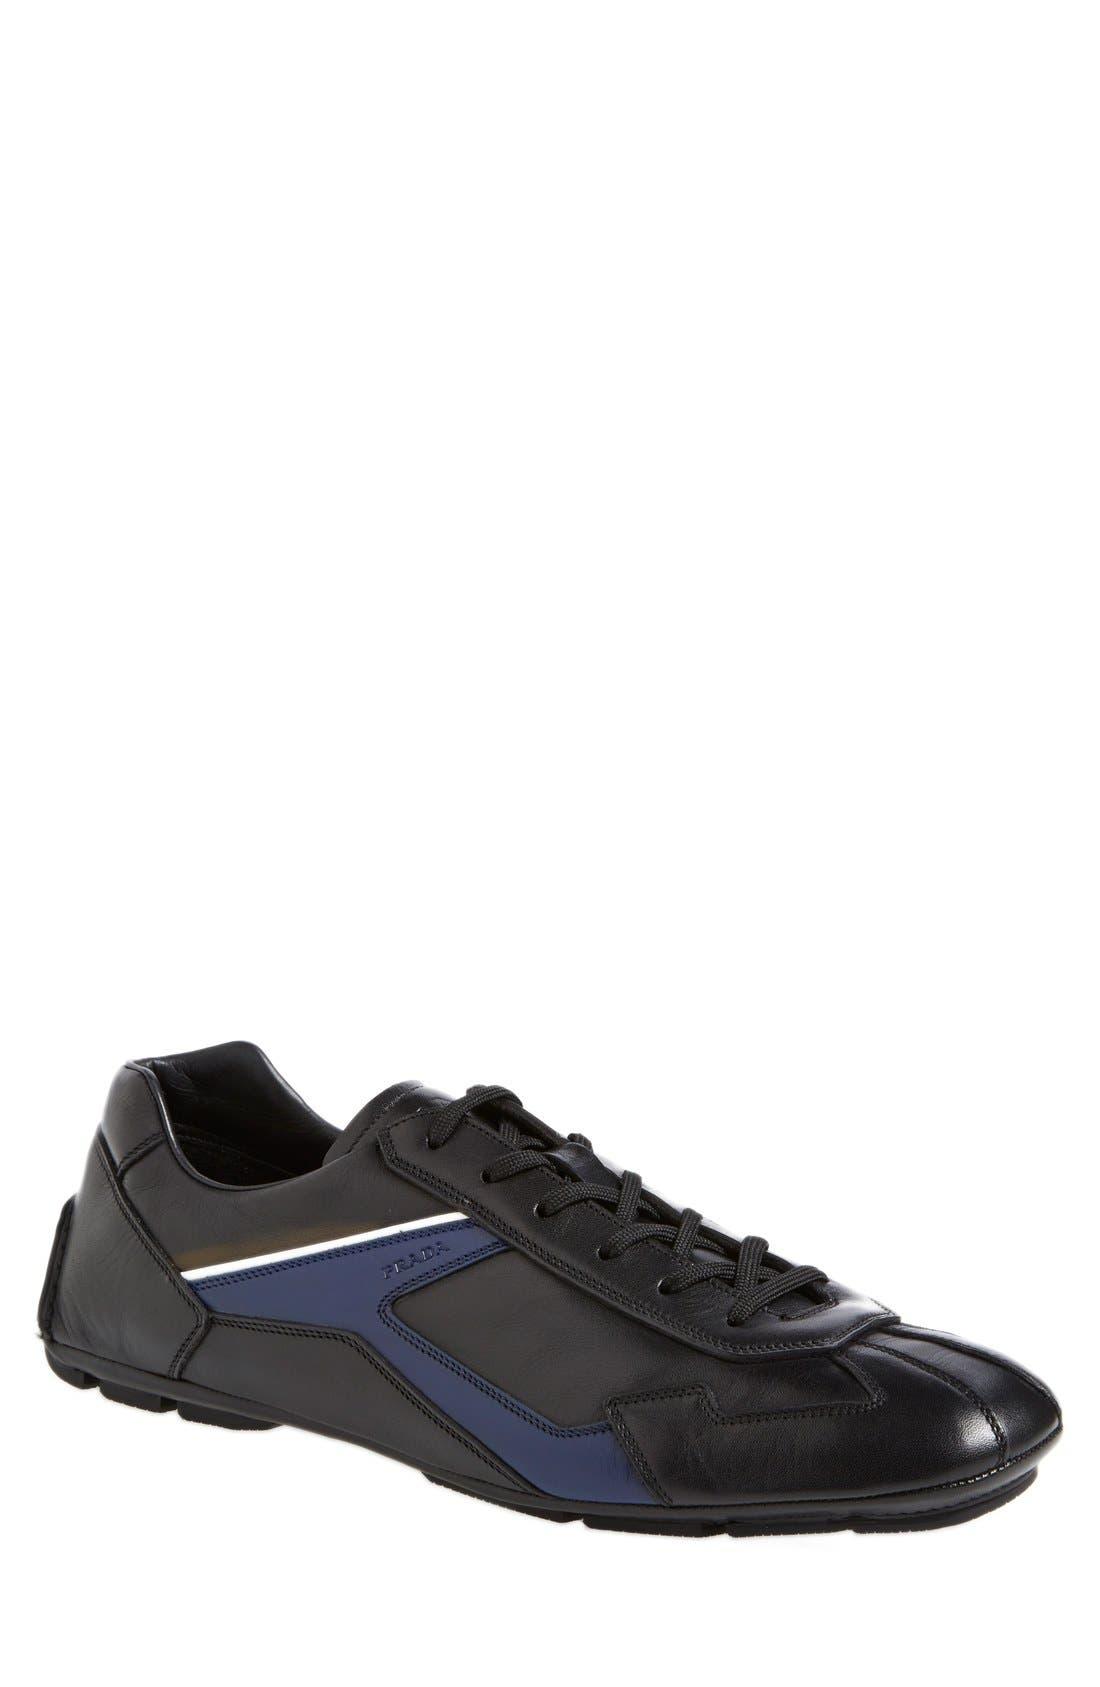 'Monte Carlo' Sneaker,                             Main thumbnail 1, color,                             001